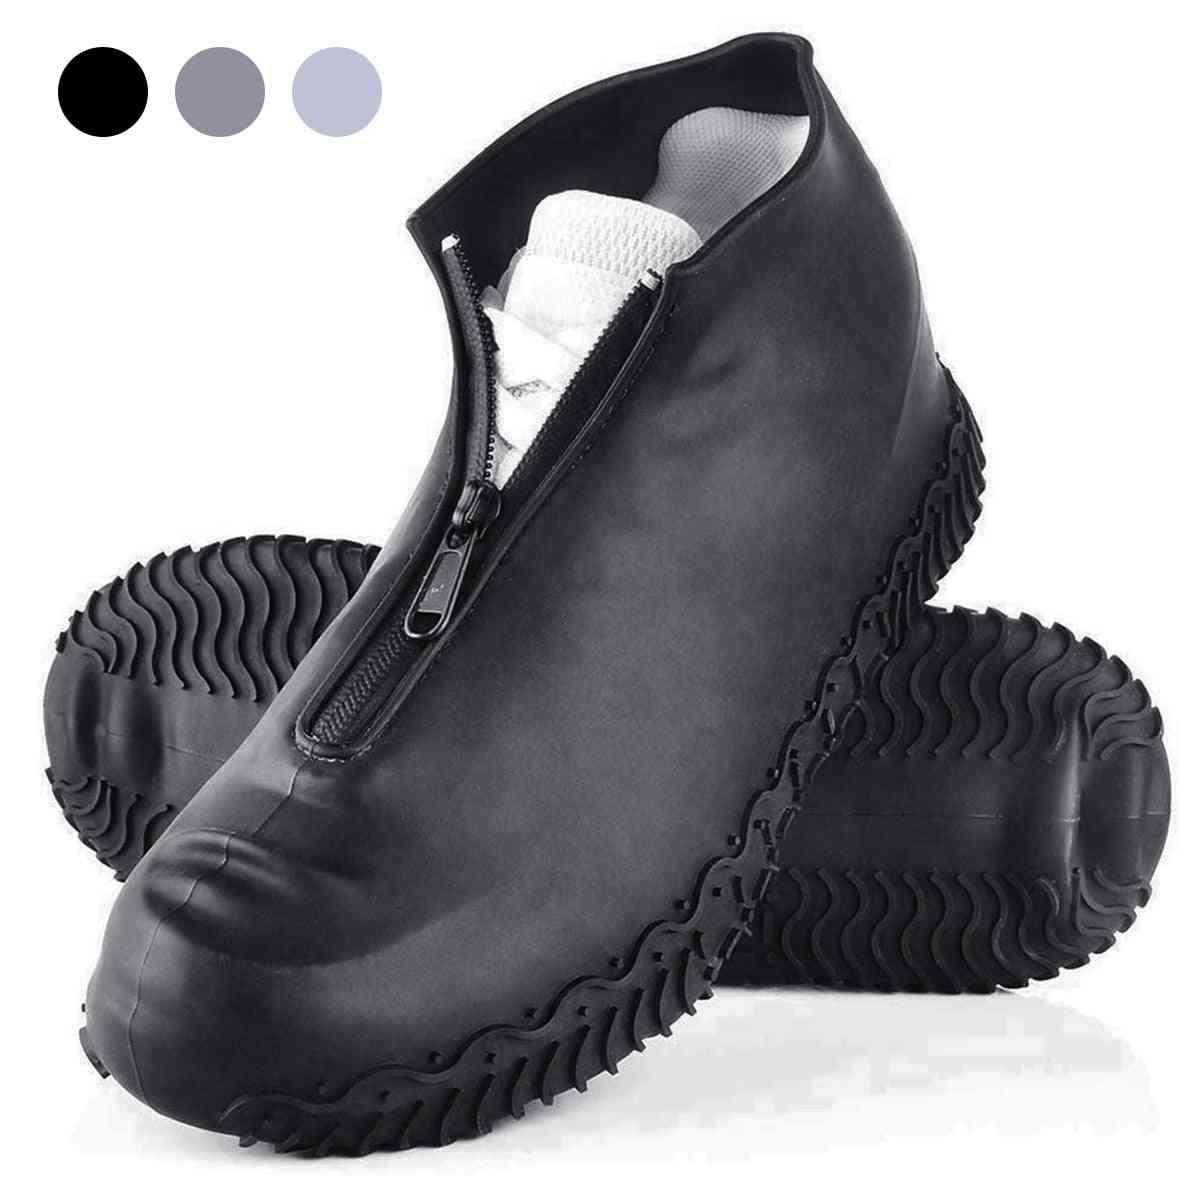 Reusable Folding Not-slip Silicone Rain Shoe Covers